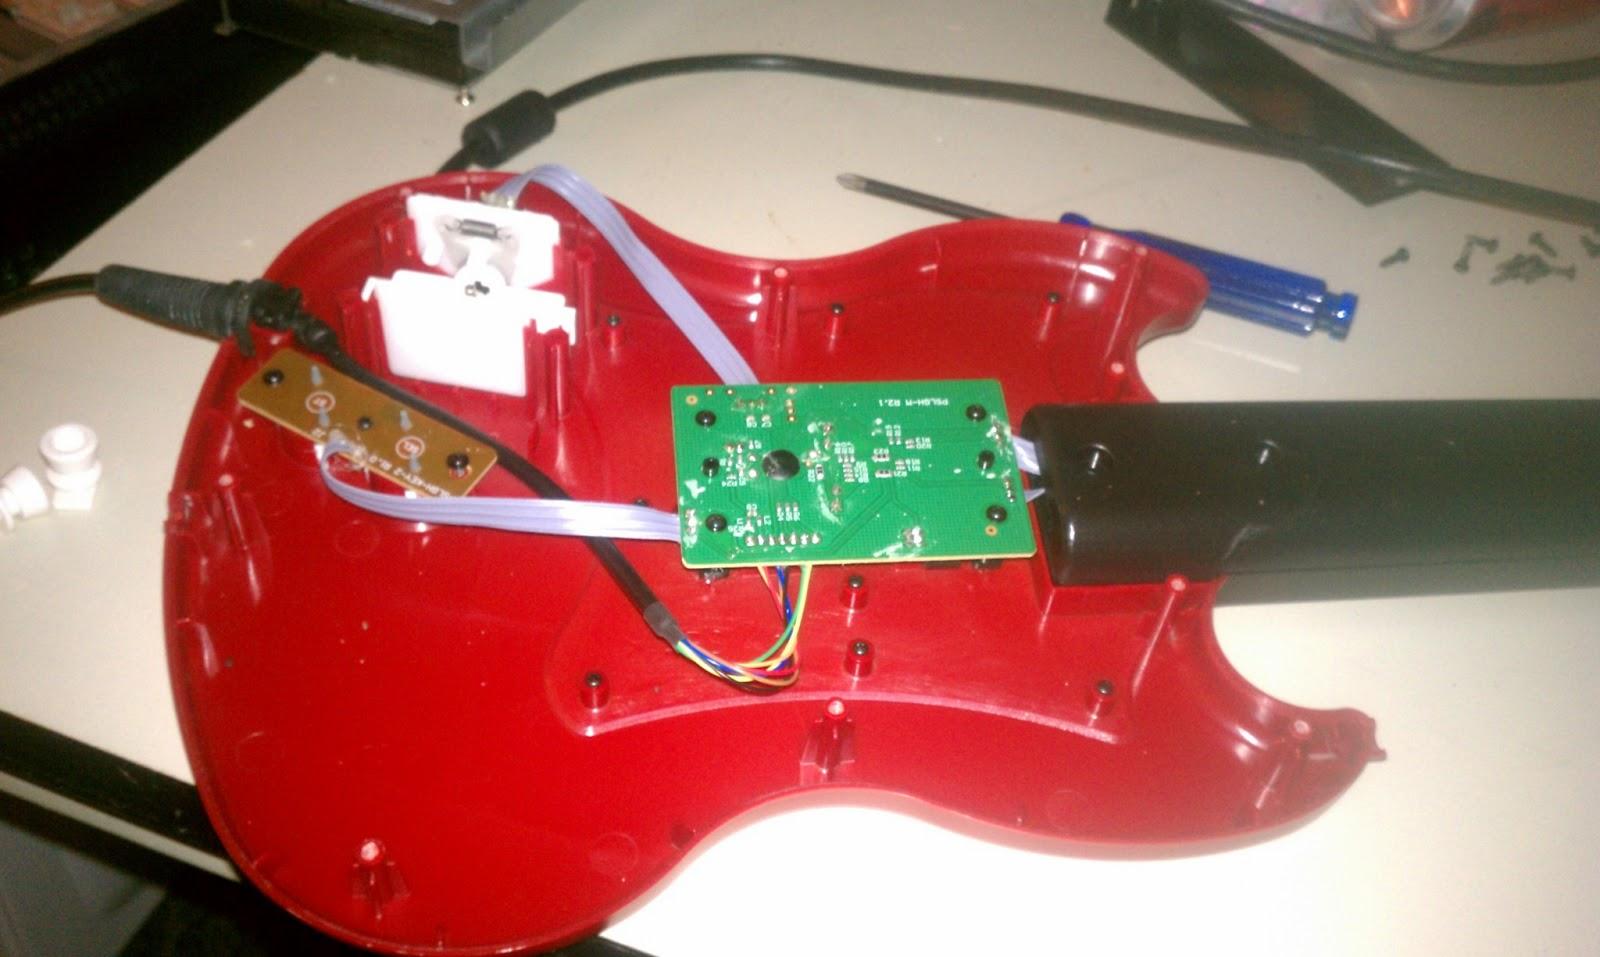 Guitar Freaks Arcade metal guitar holder brackets